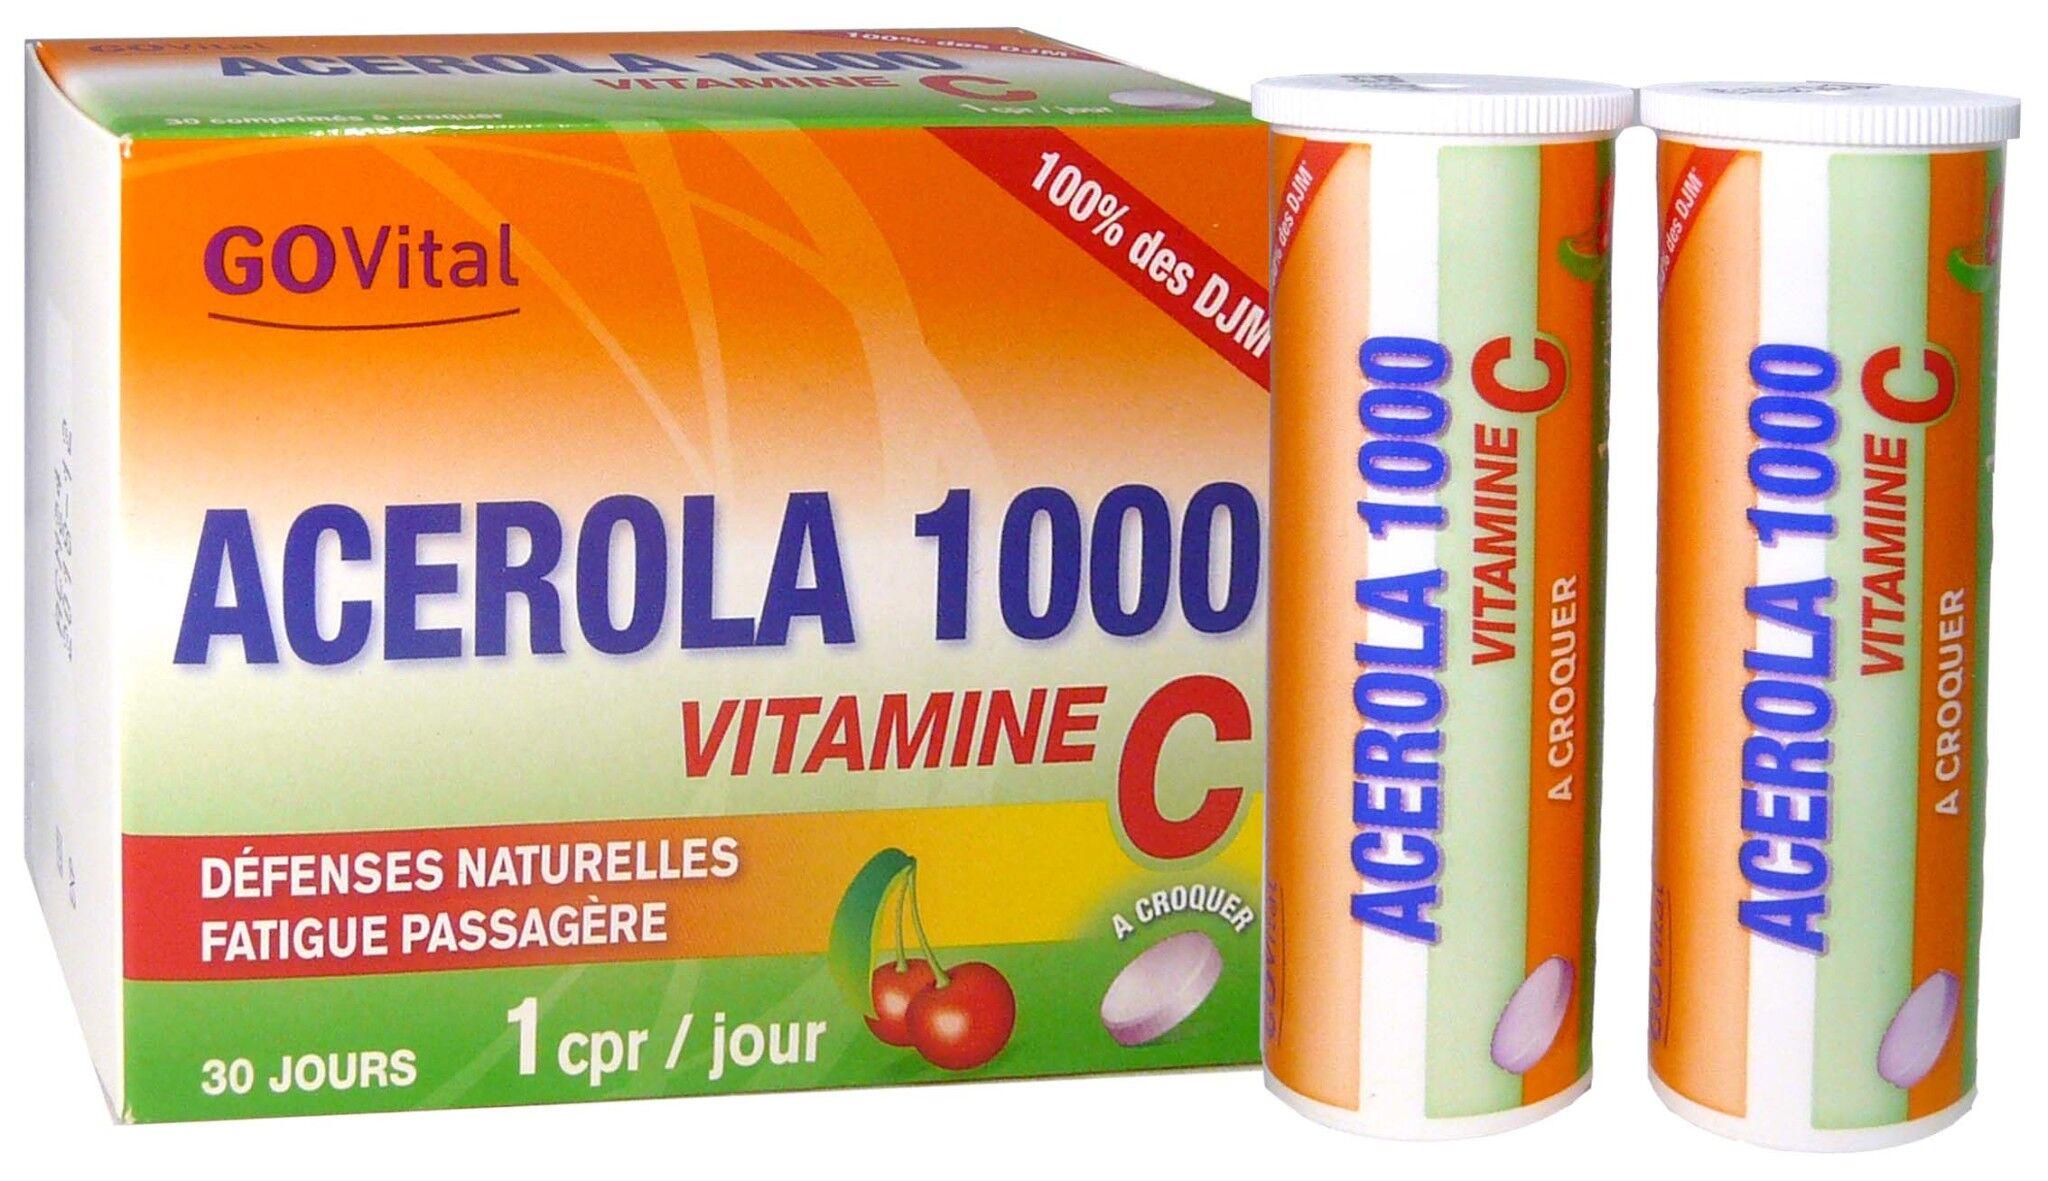 URGO Go vital acerola 1000+vitamine c 30 comprimes a croquer